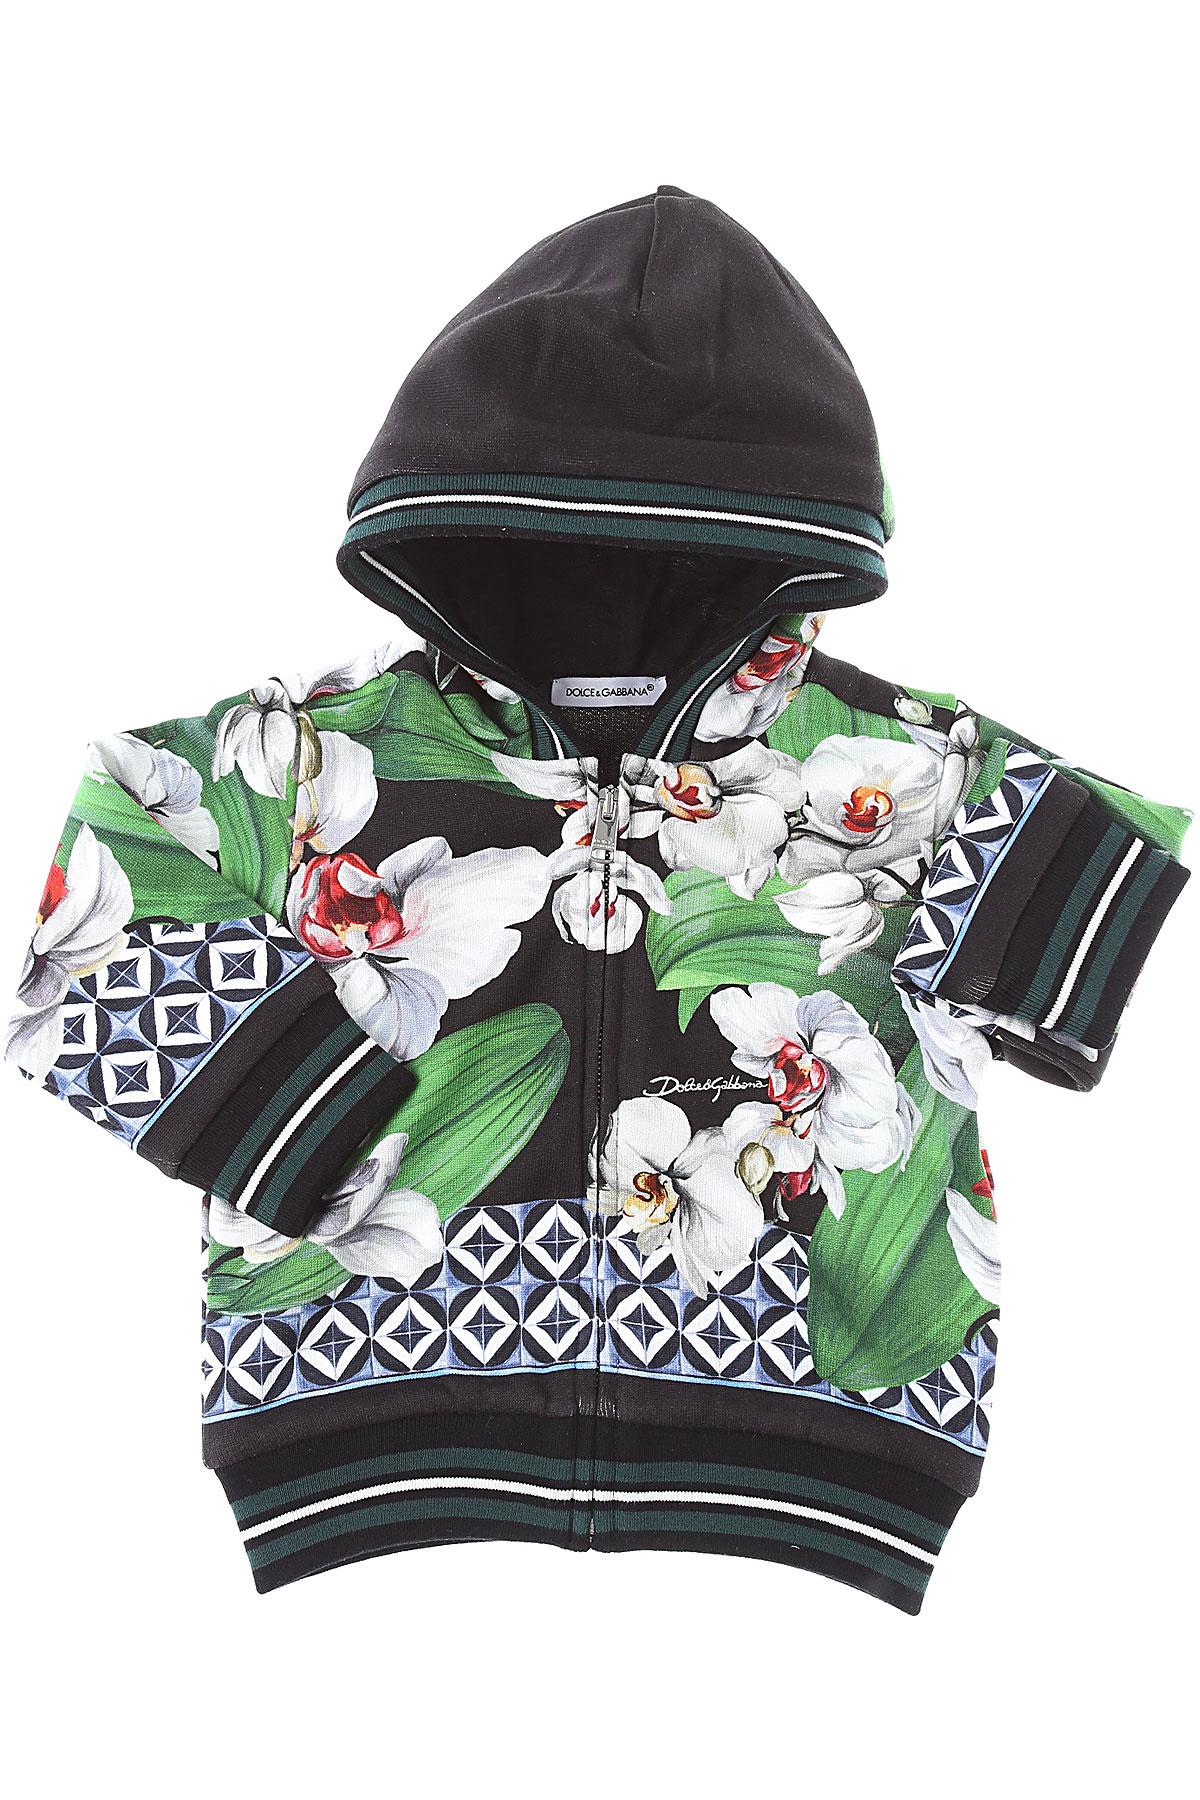 Dolce & Gabbana Baby Sweatshirts & Hoodies for Girls On Sale, Green, Cotton, 2019, 12M 18M 24M 2Y 9M